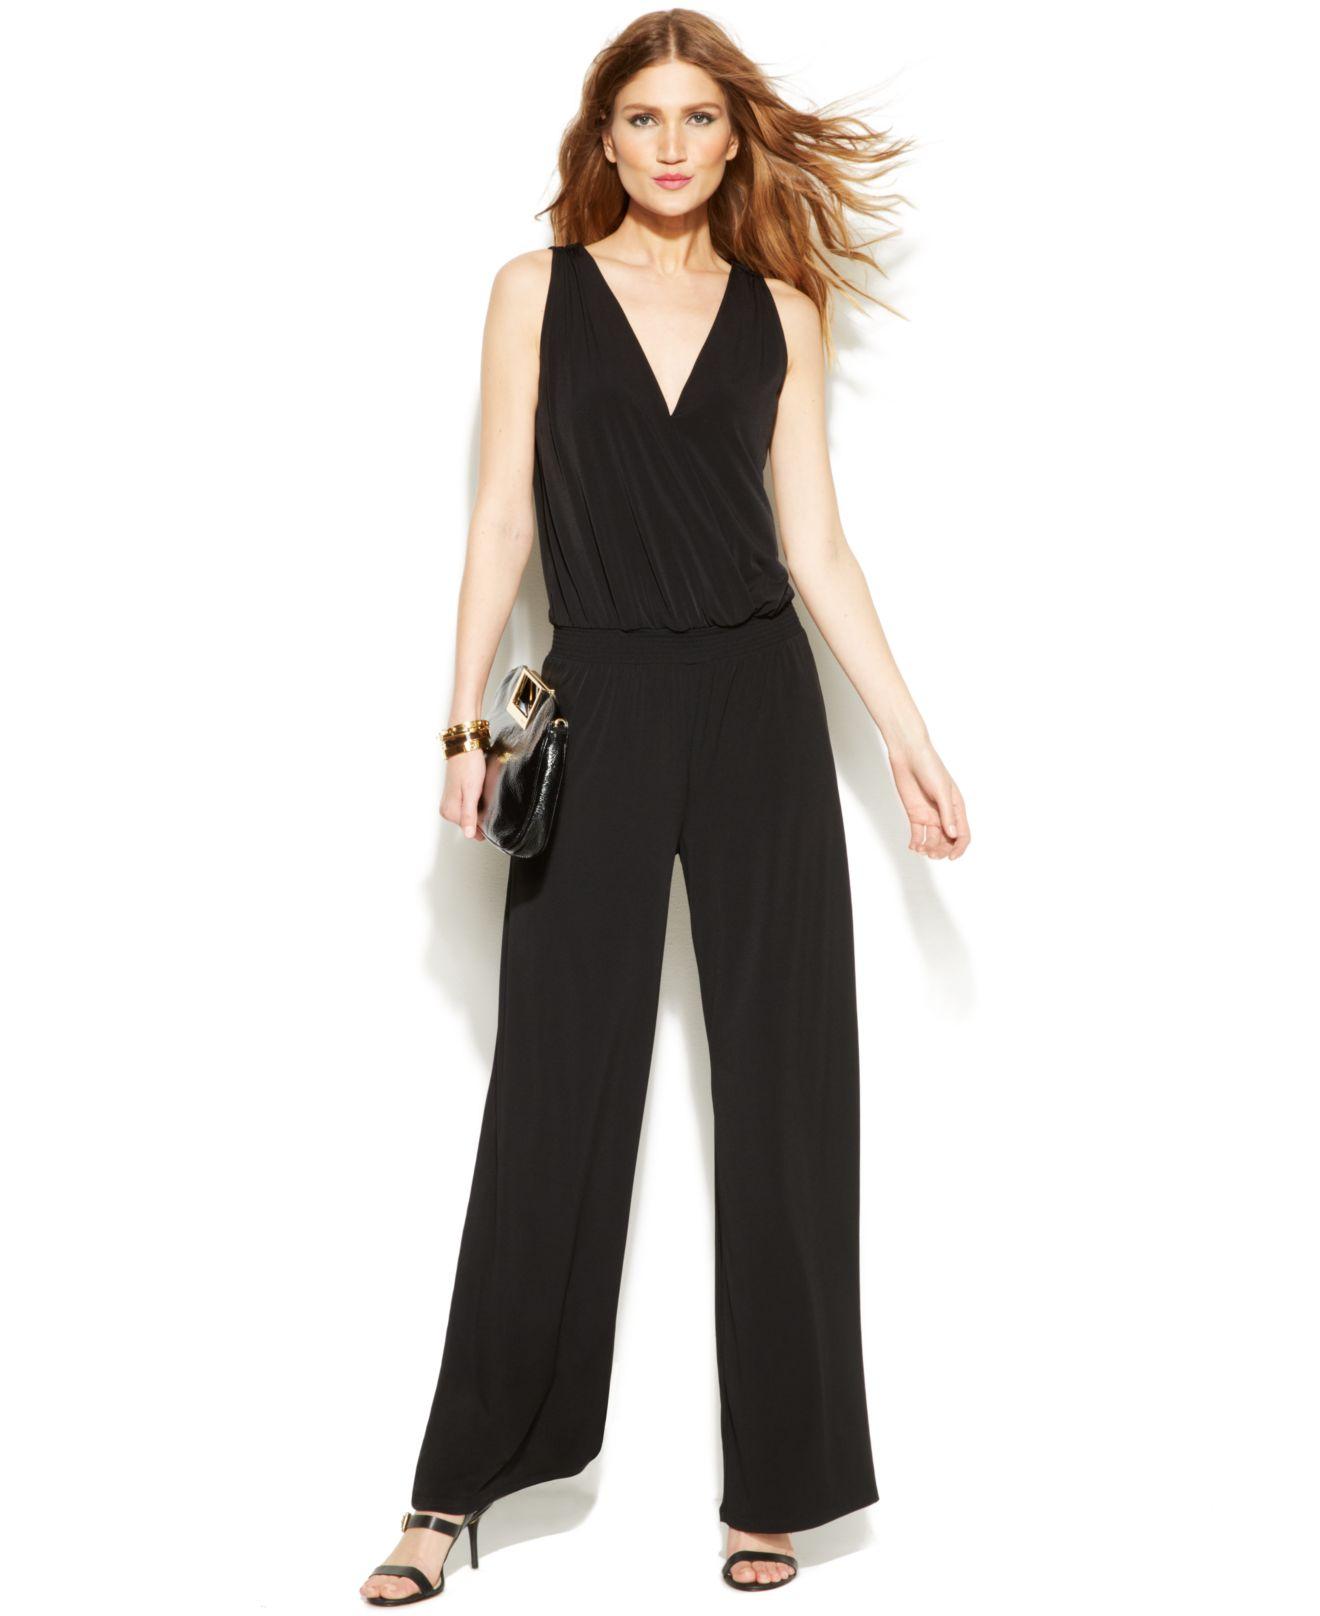 michael kors michael wide leg sleeveless jumpsuit in black black gold lyst. Black Bedroom Furniture Sets. Home Design Ideas